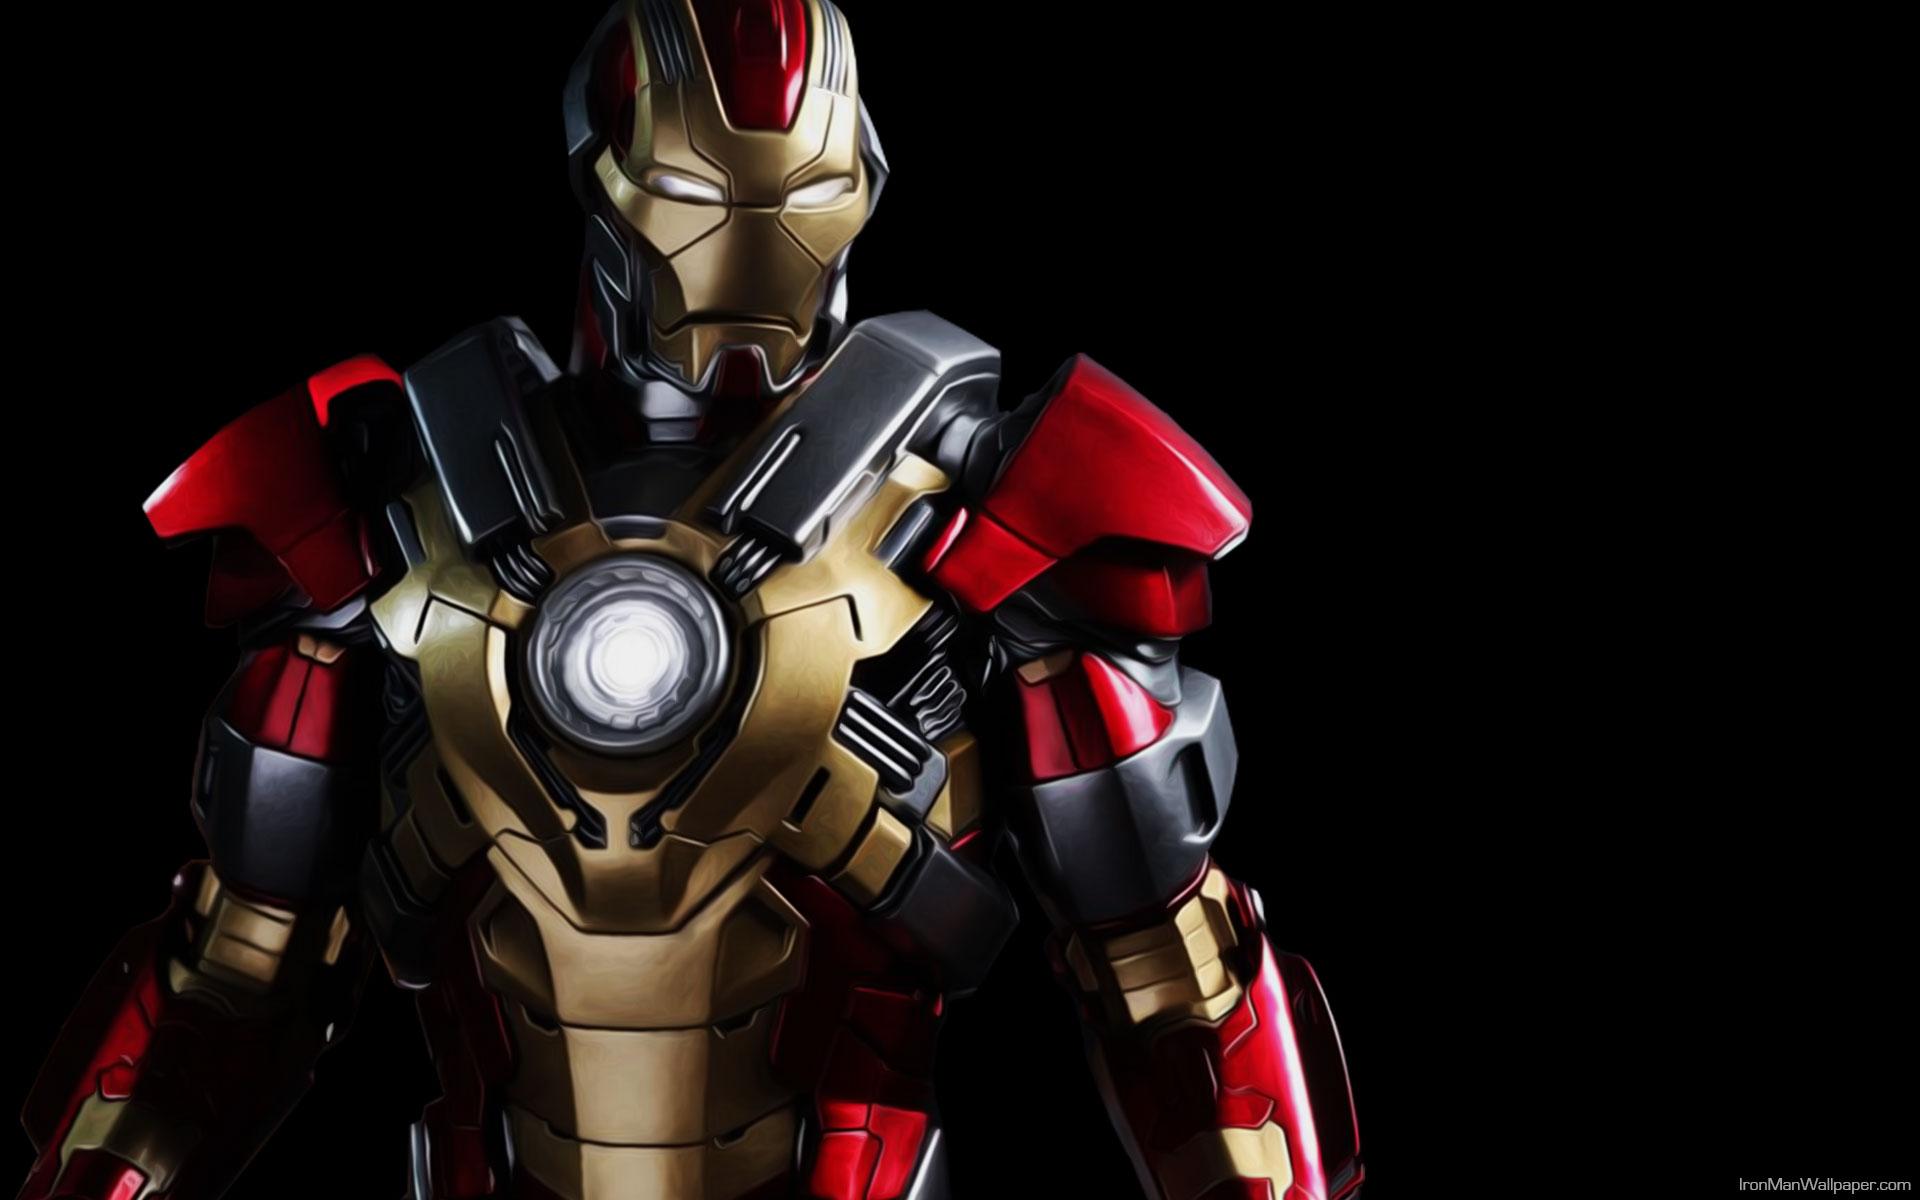 Iron Man Wallpaper, Iron Man Wallpaper. Heartbreaker